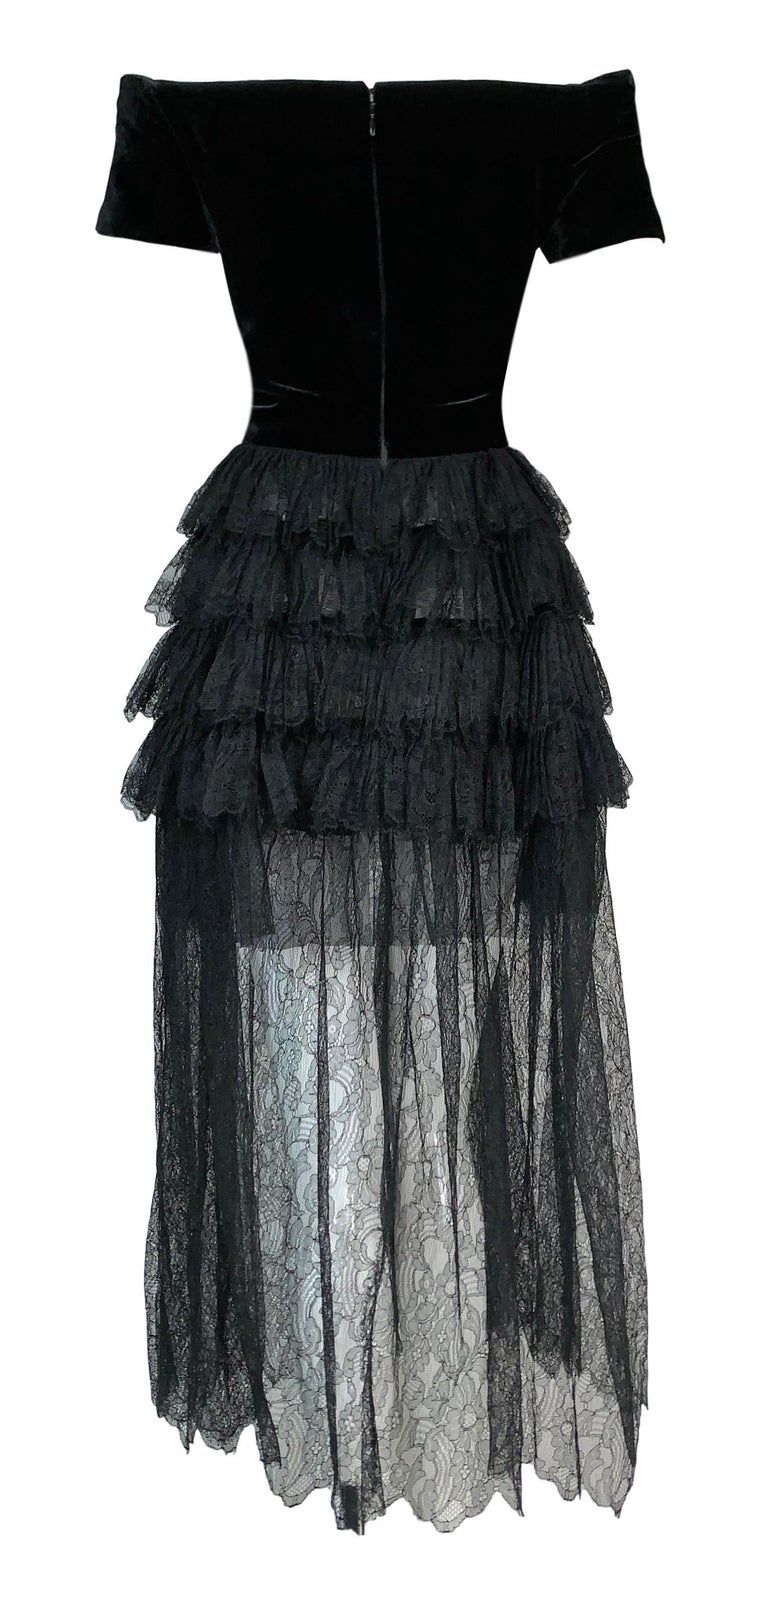 Black F/W 1991 Chanel Runway Off Shoulder Velvet & Lace Gown Dress For Sale